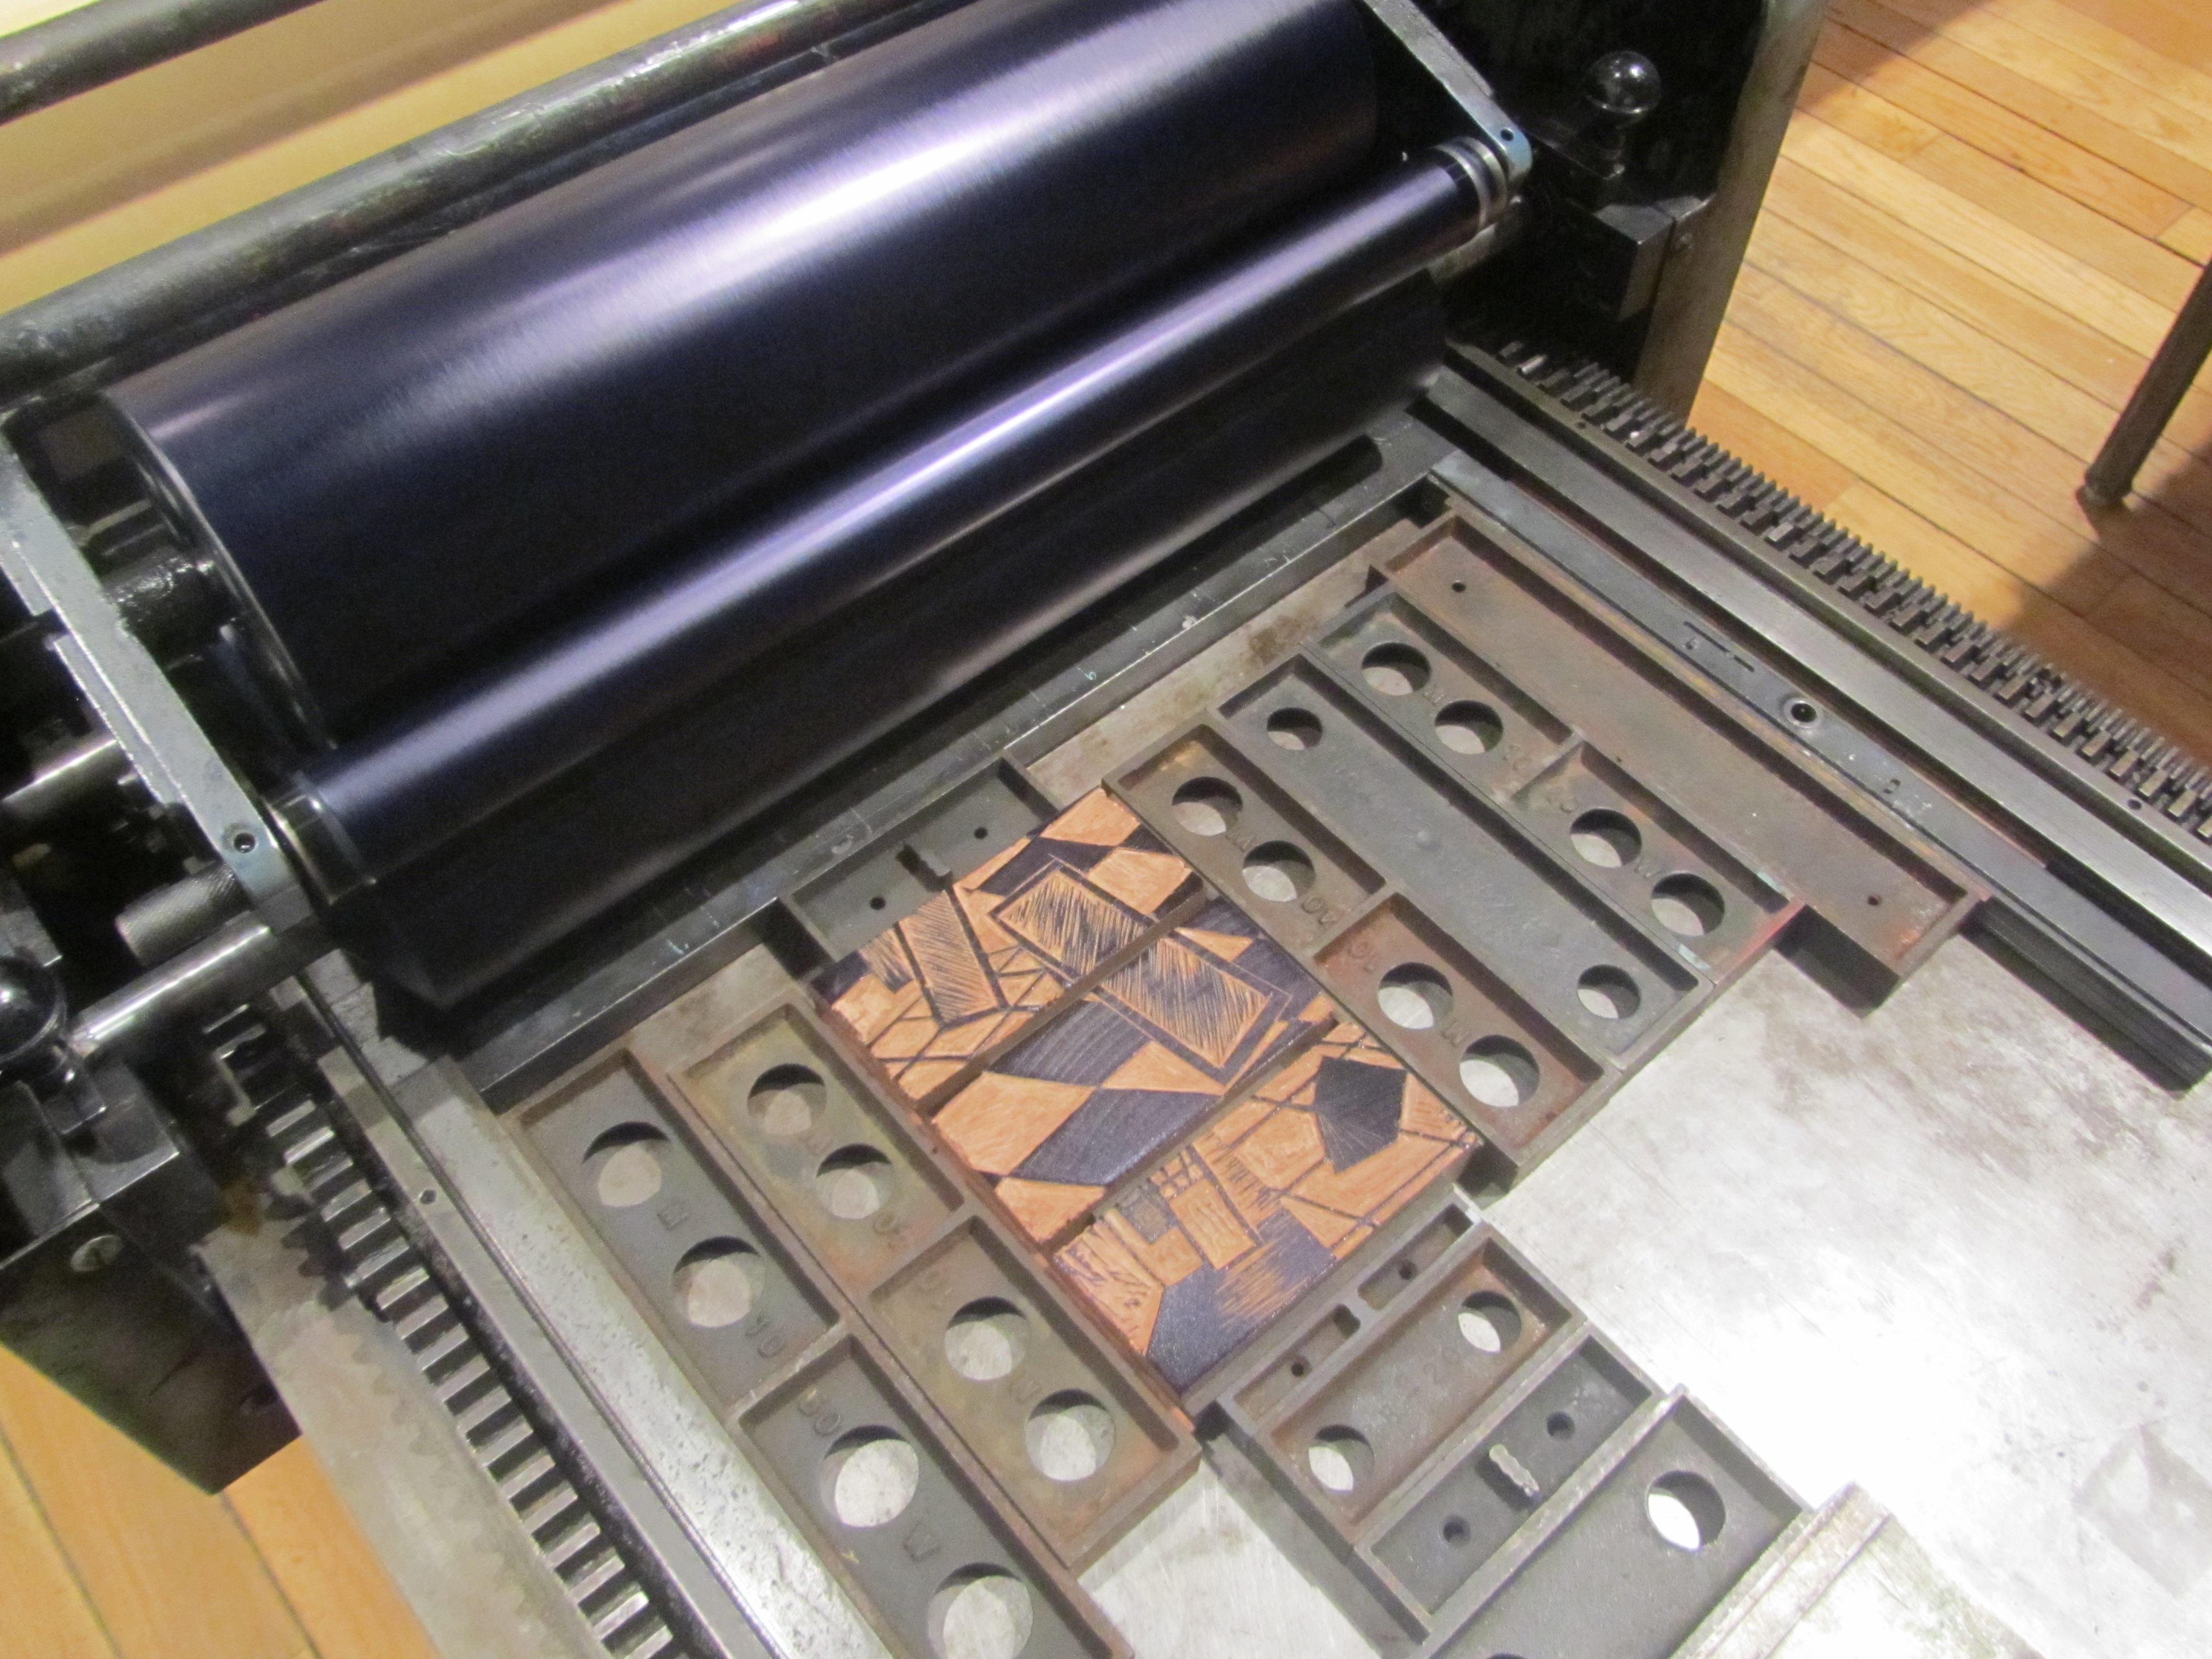 Wood engraving blocks ready for printing